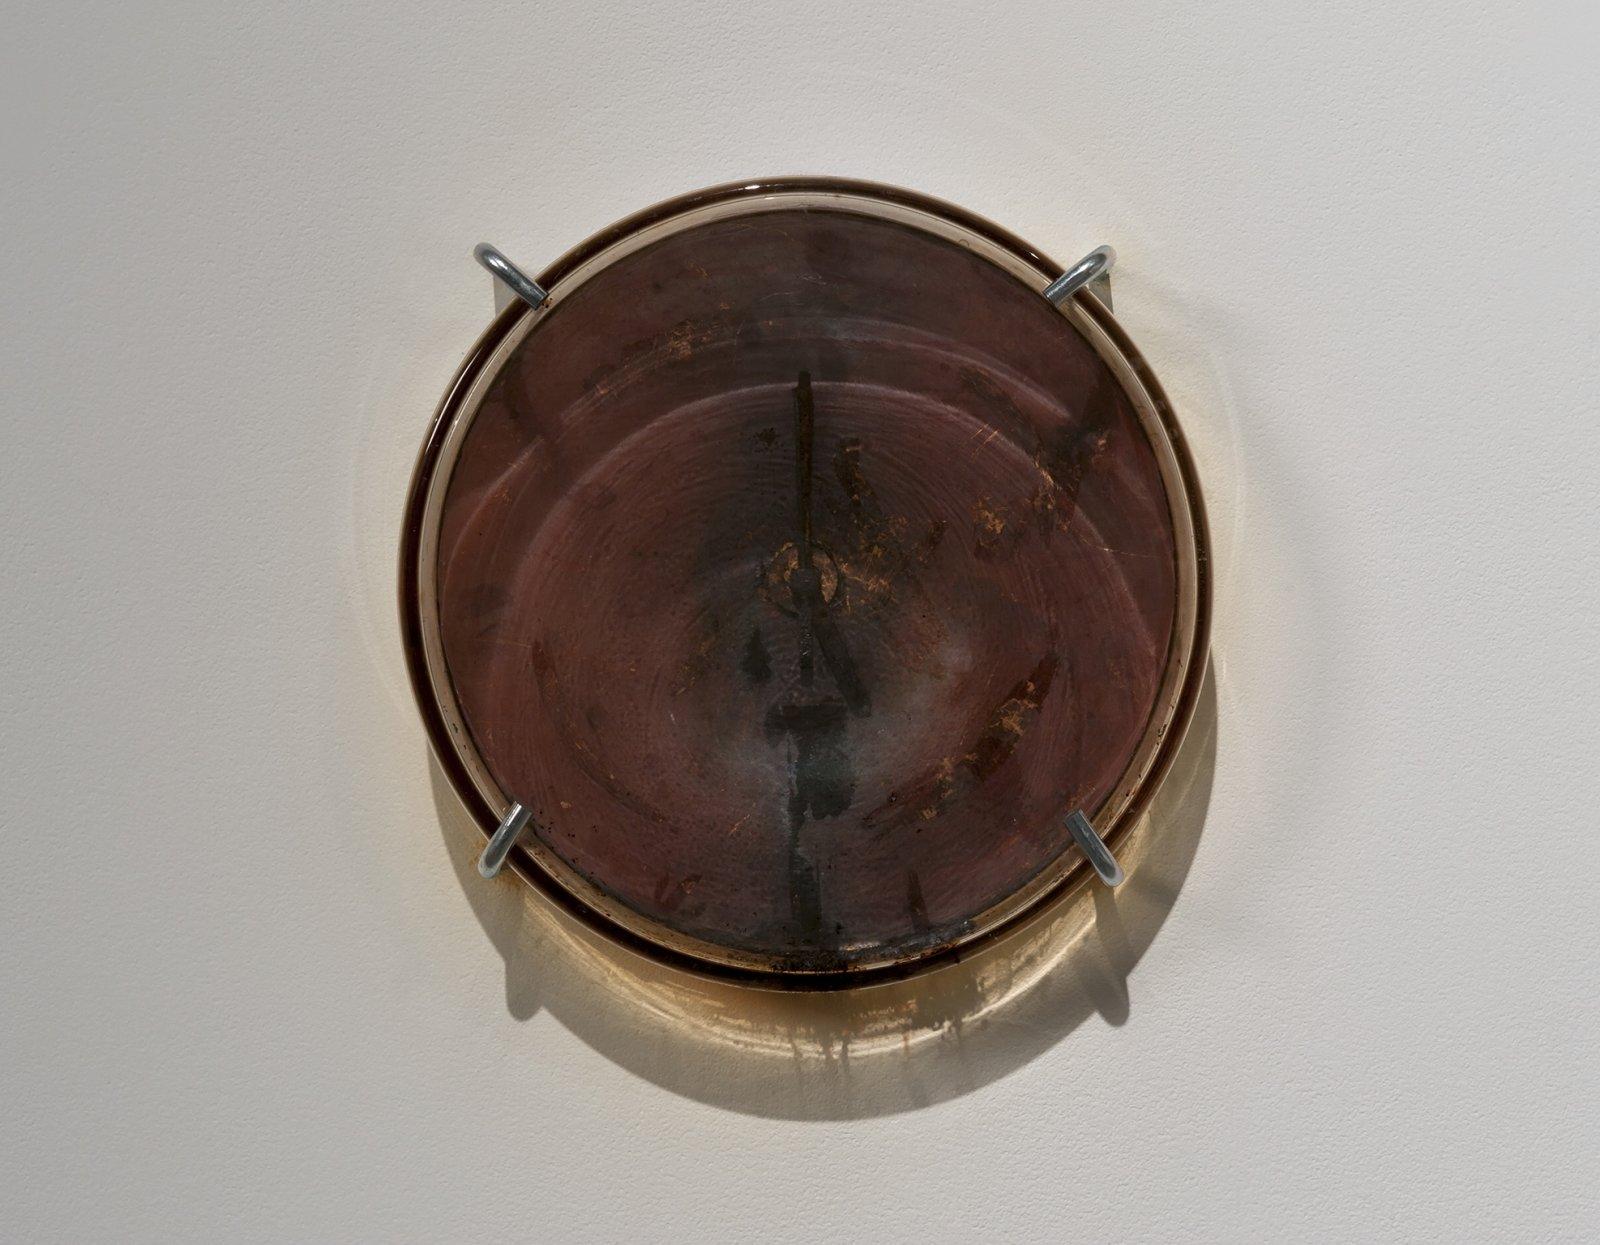 Julia Feyrer, Sublimation Clock, 2012, iodine crystals, silver leaf, lampblack, glass, acrylic, metal clock hands, quartz clock movement, 12 diameter x 3 in. (30 diameter x 7 cm) by Julia Feyrer